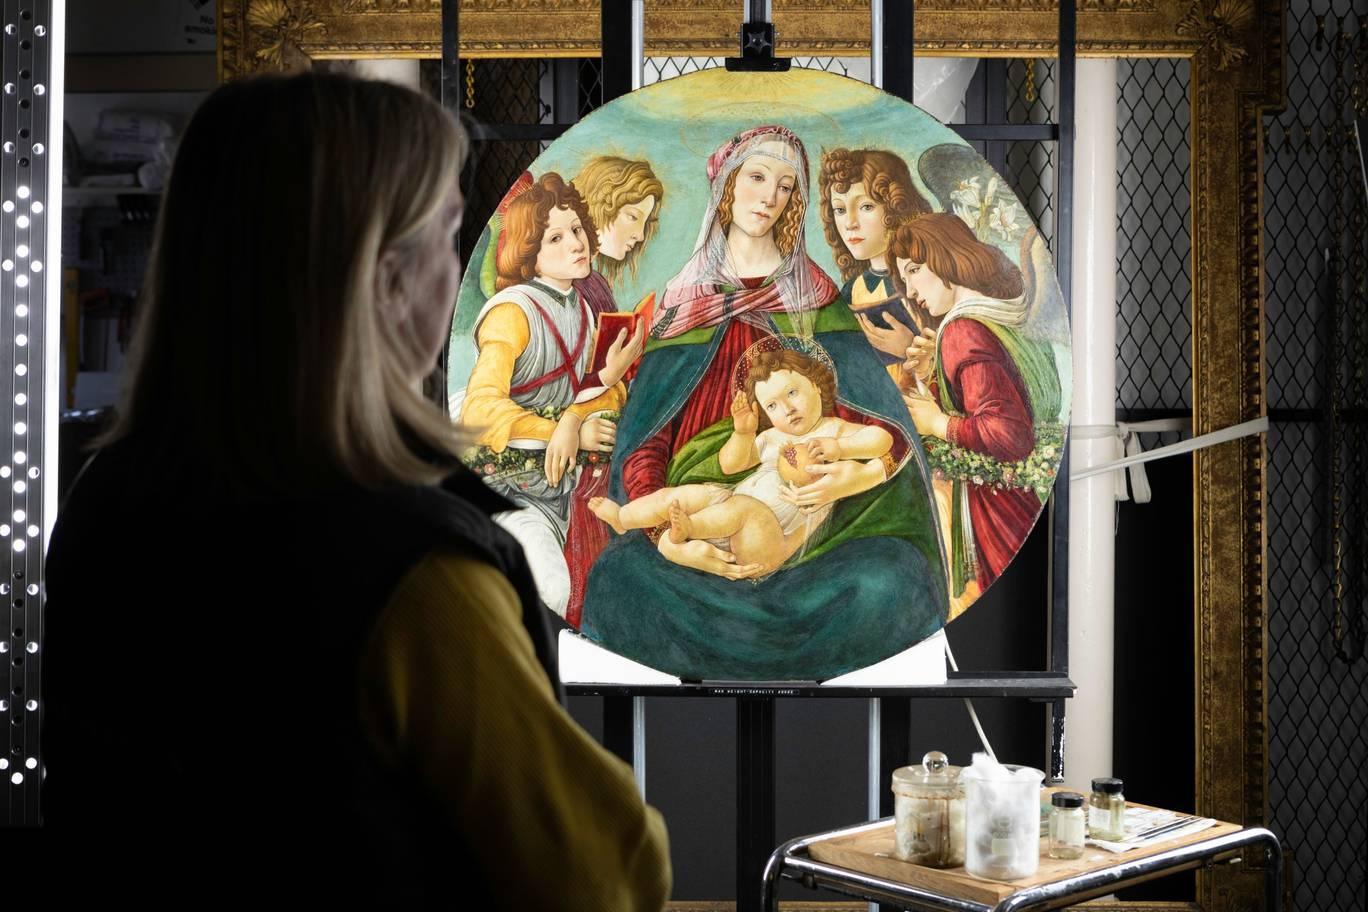 ARTS-Botticelli-14454966.jpg